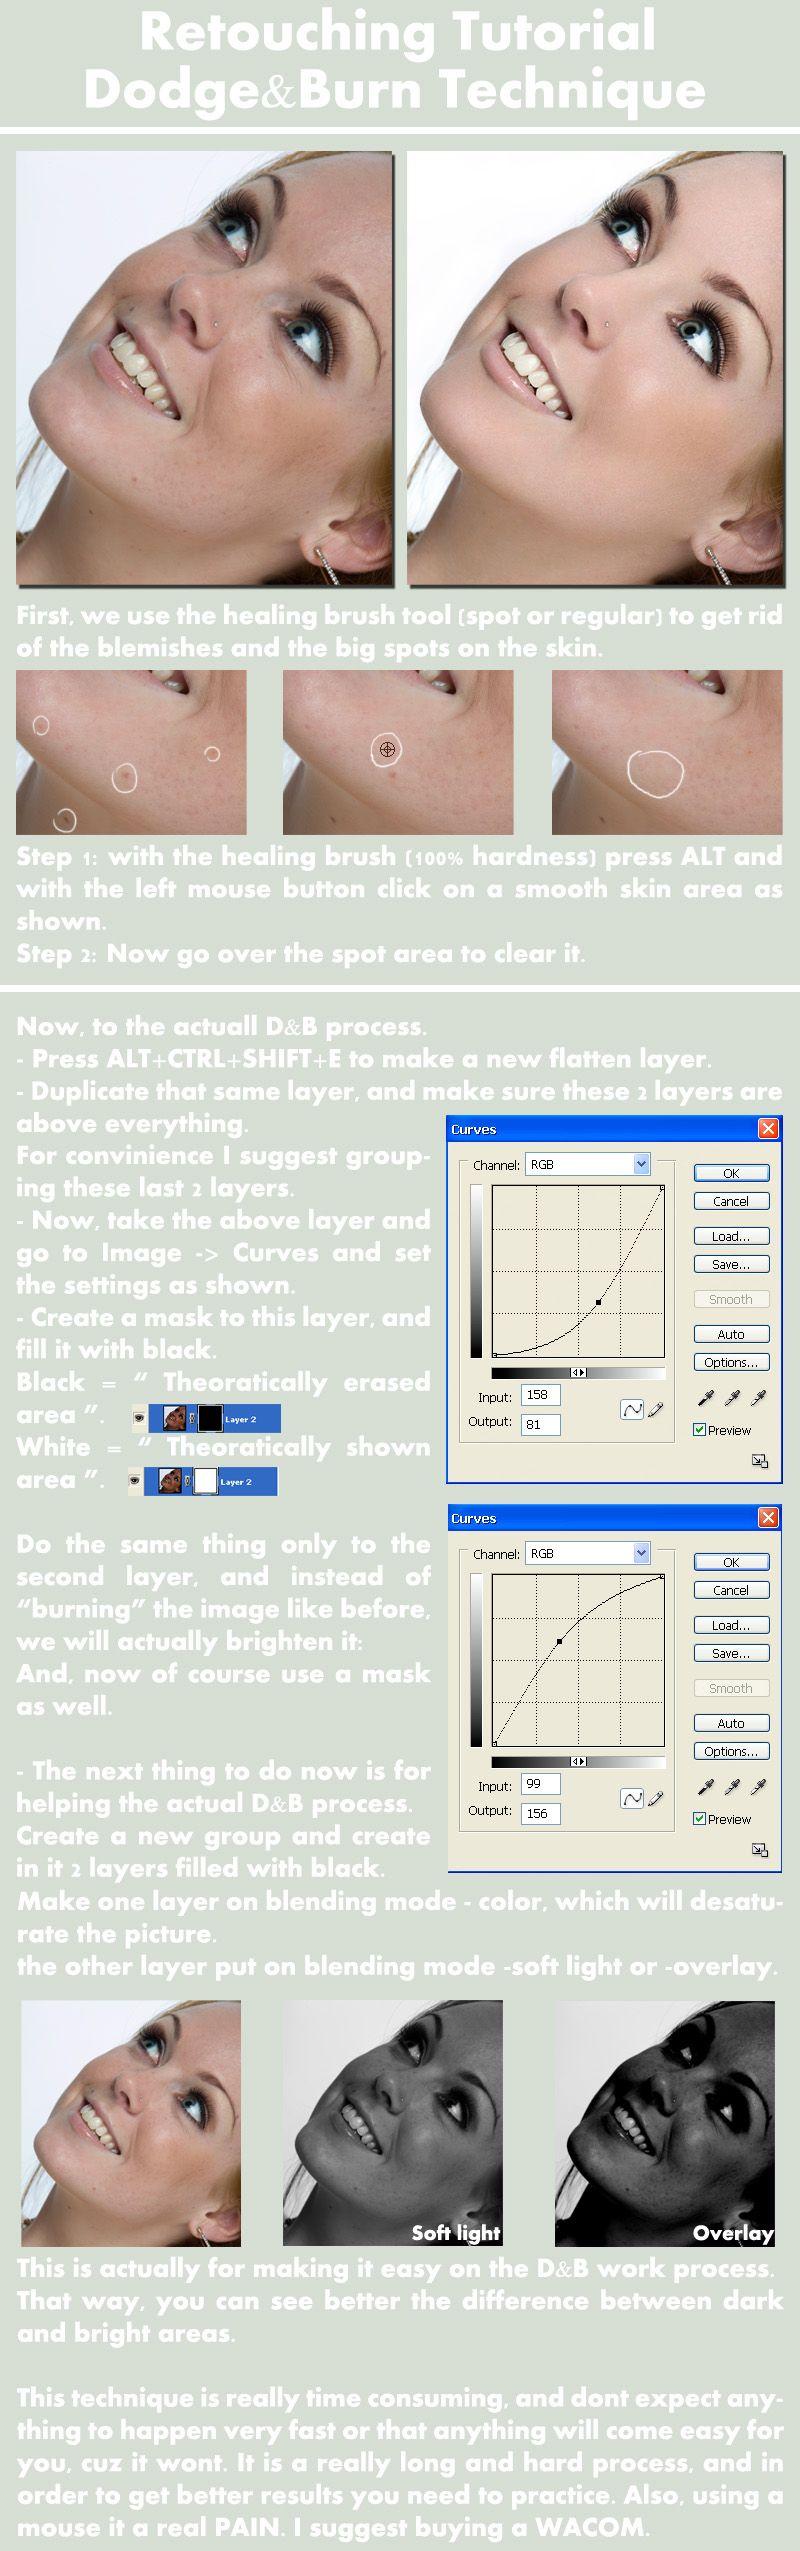 Dodge and Burn Tutorial Part 1 by ~Nienna1990 on deviantART